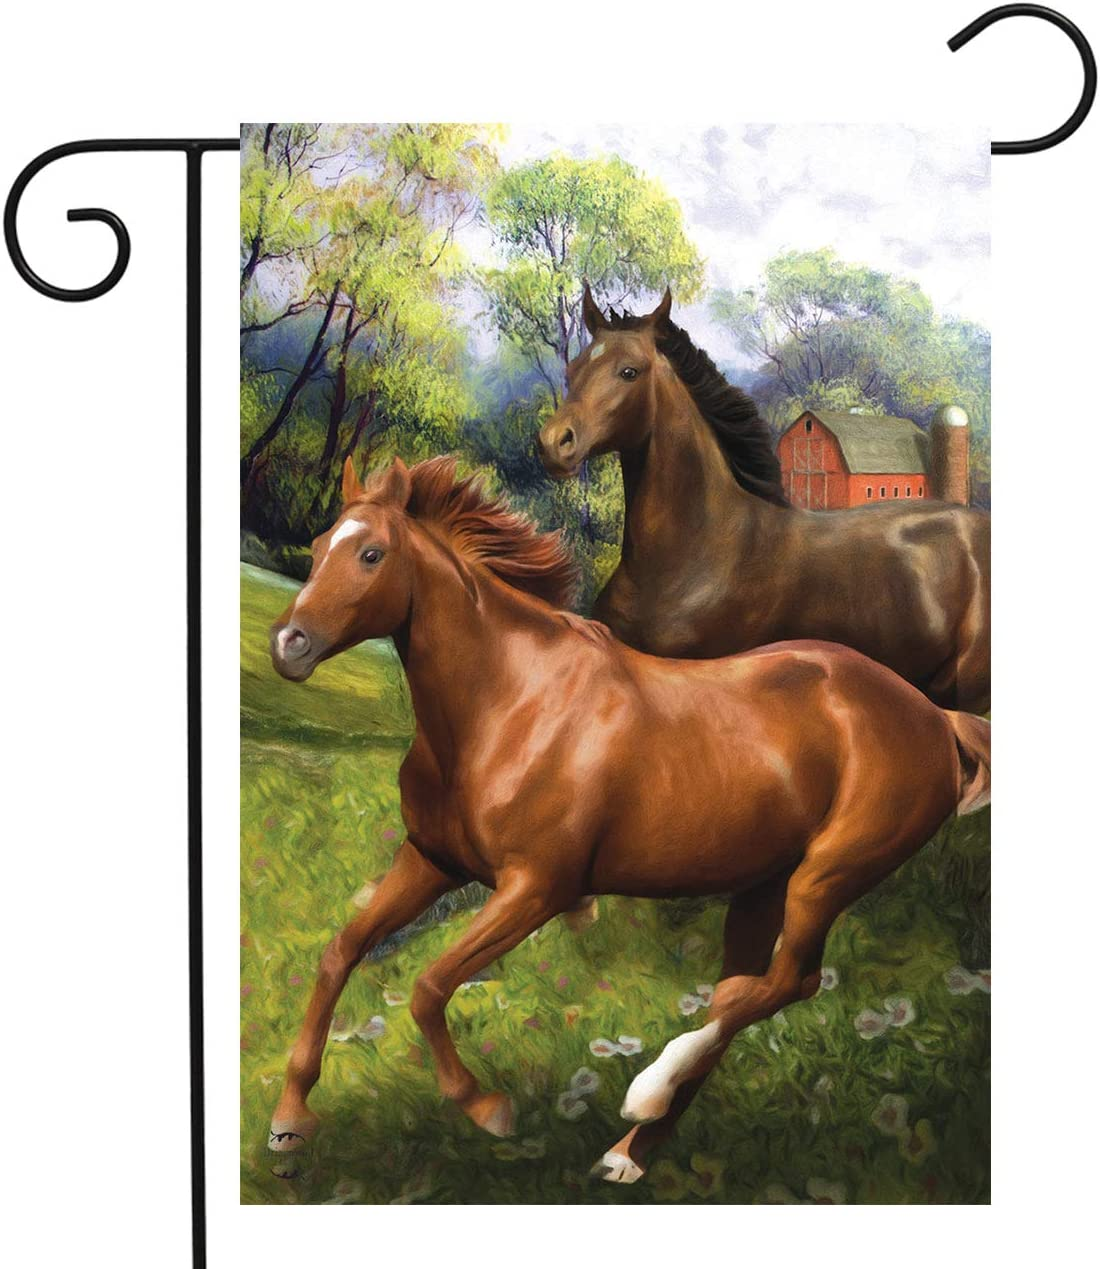 Briarwood Lane Galloping Horses Summer Garden Flag Outdoors Wildlife 12.5